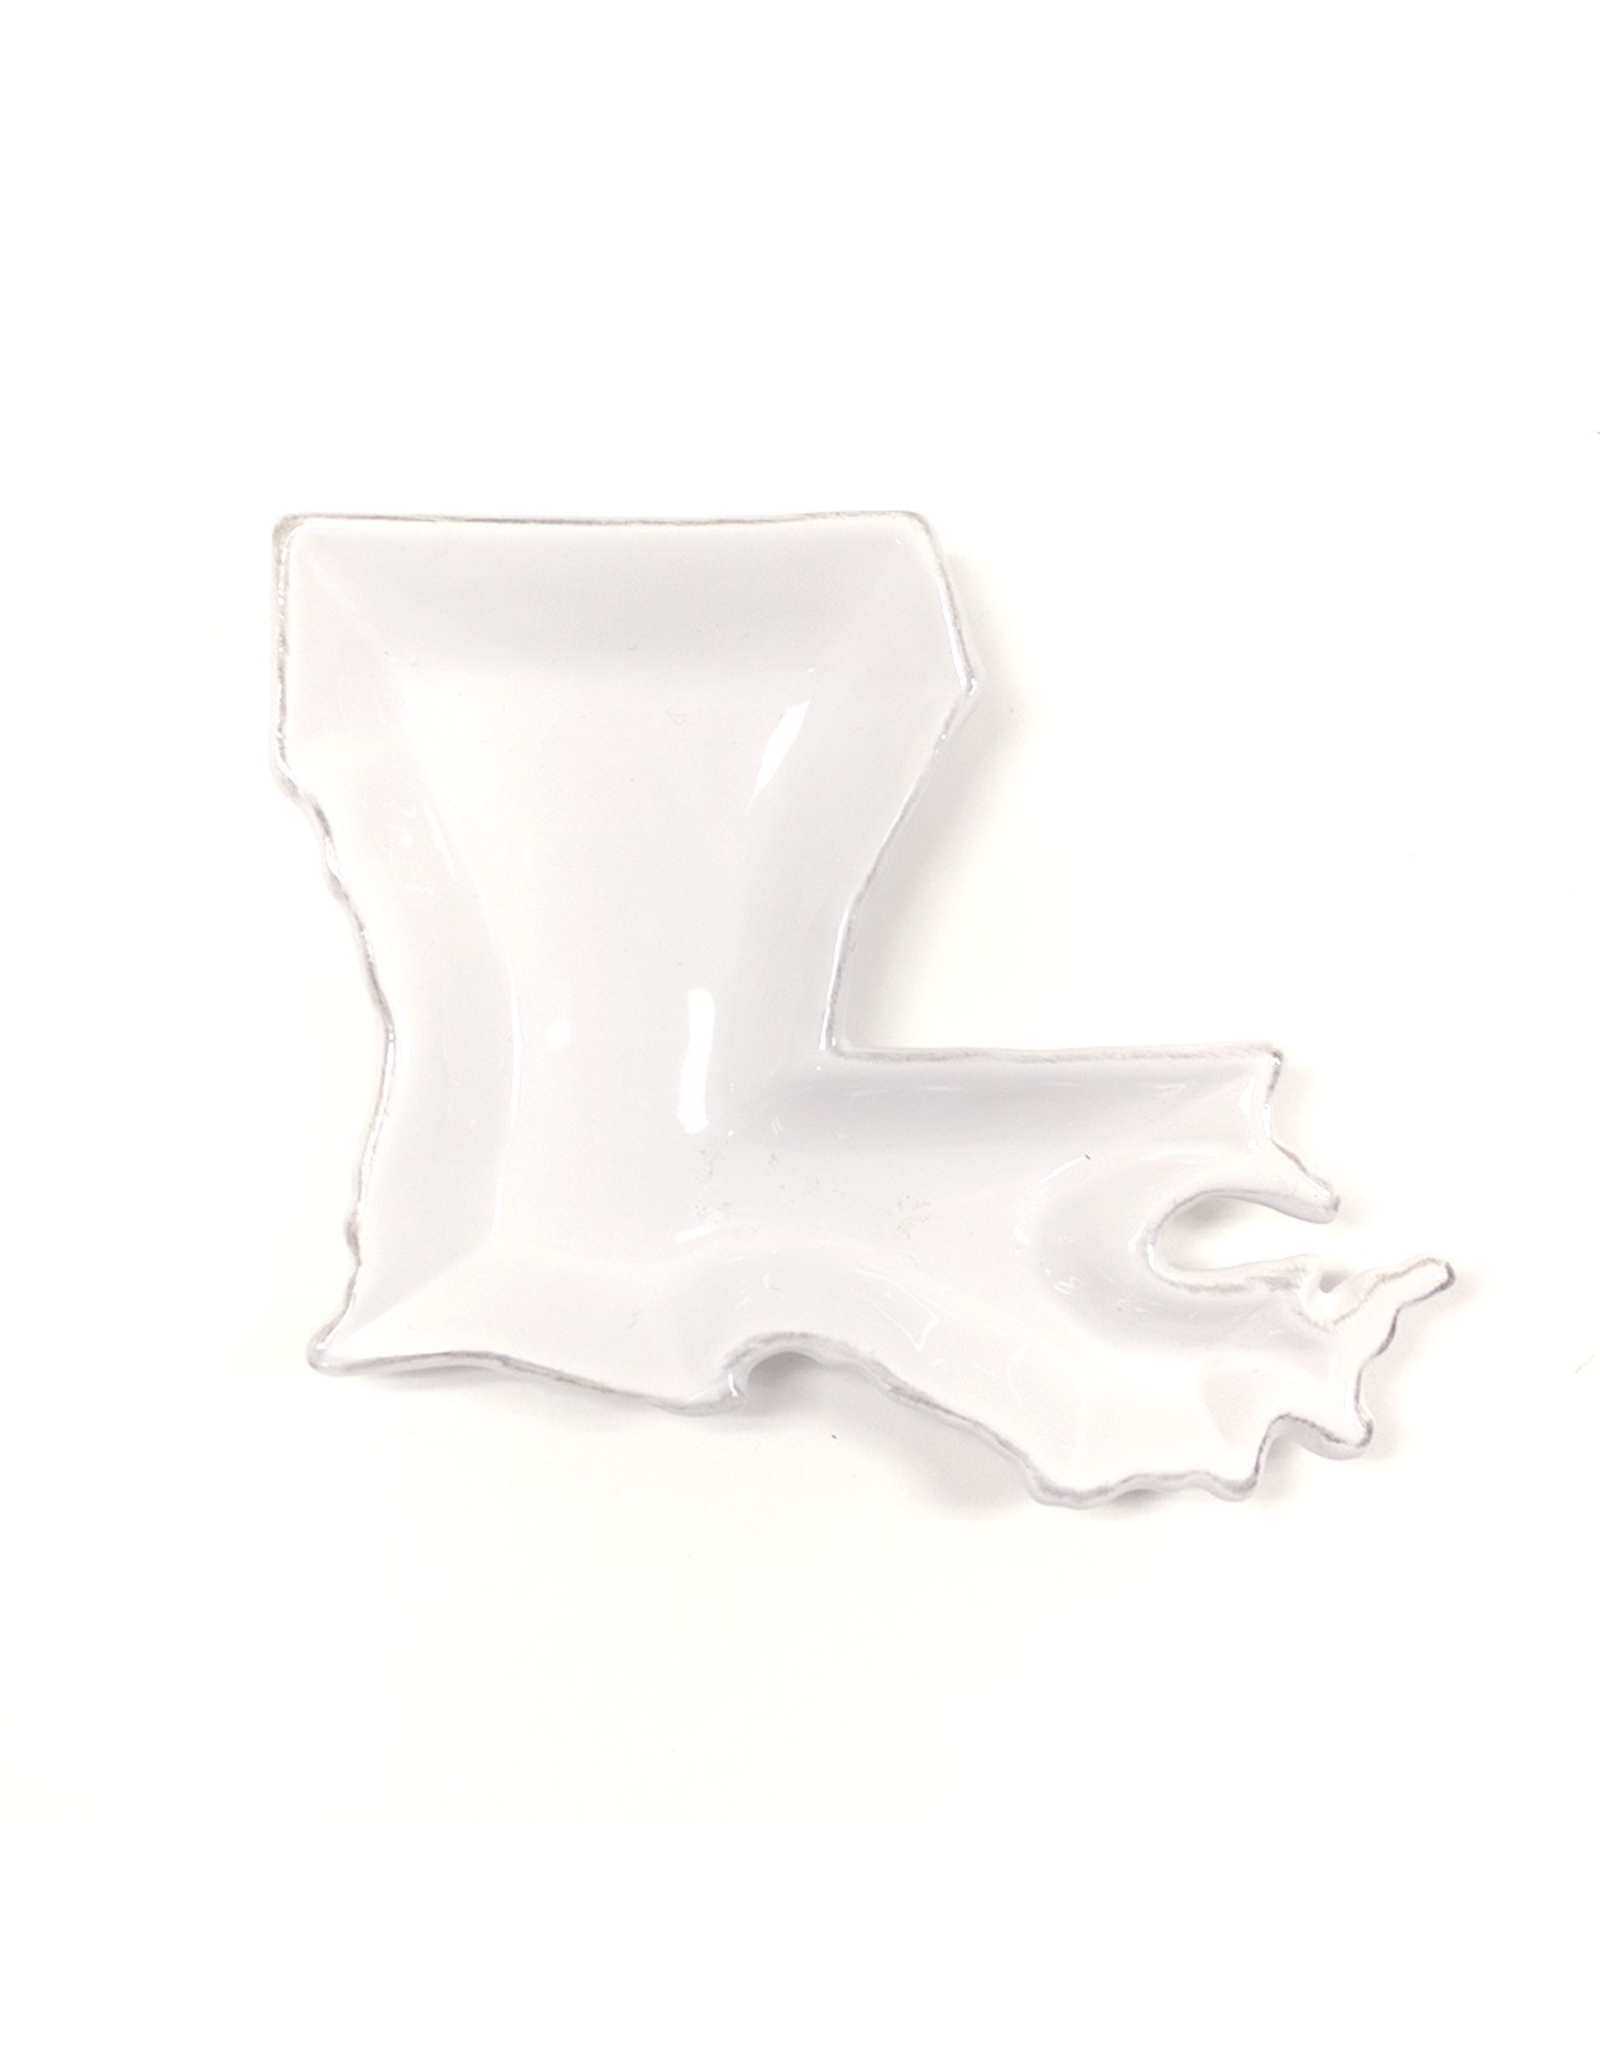 "The Royal Standard Louisiana Shaped Platter 10"""